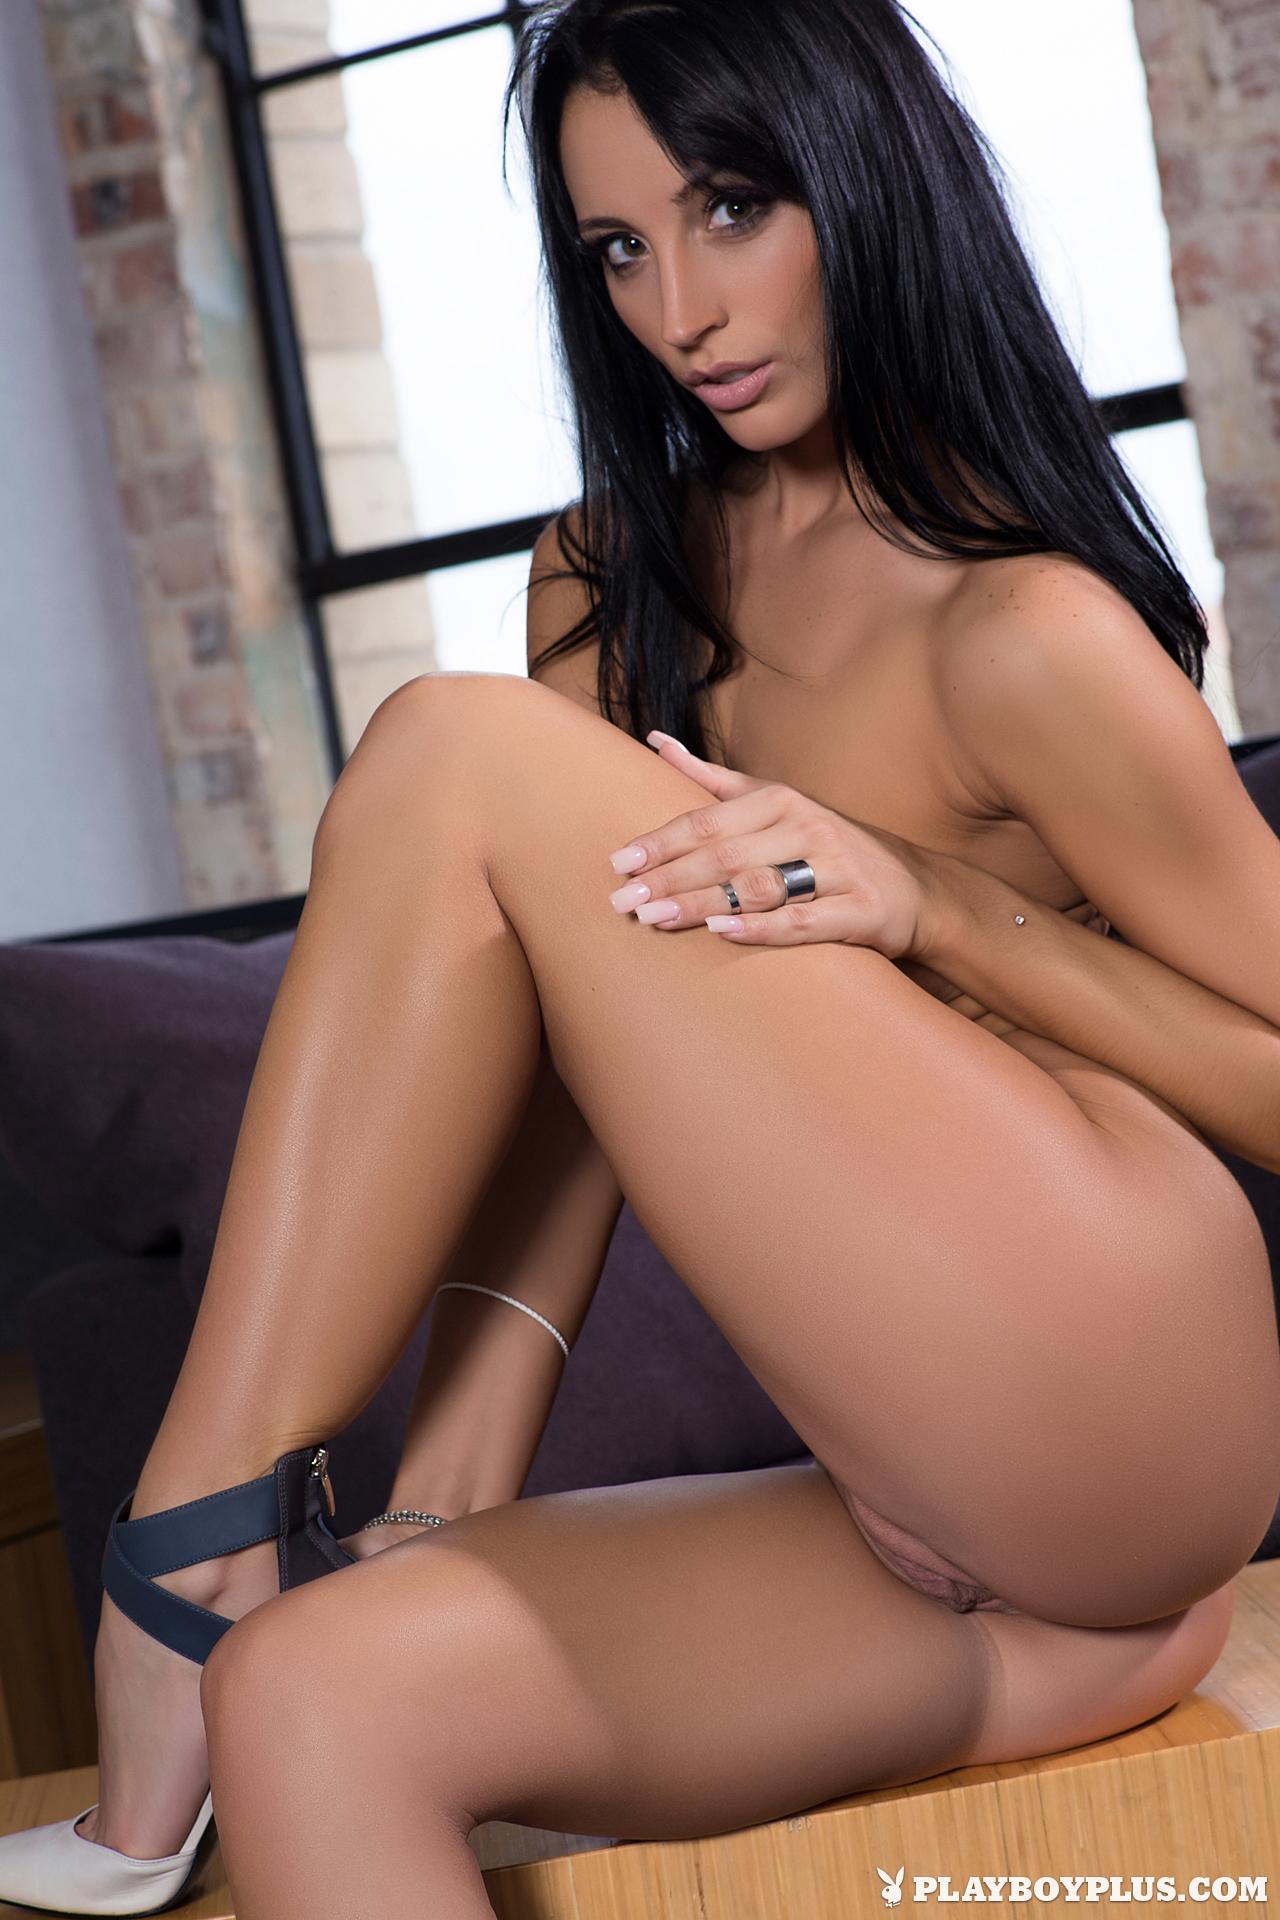 Kendra lust desnuda that